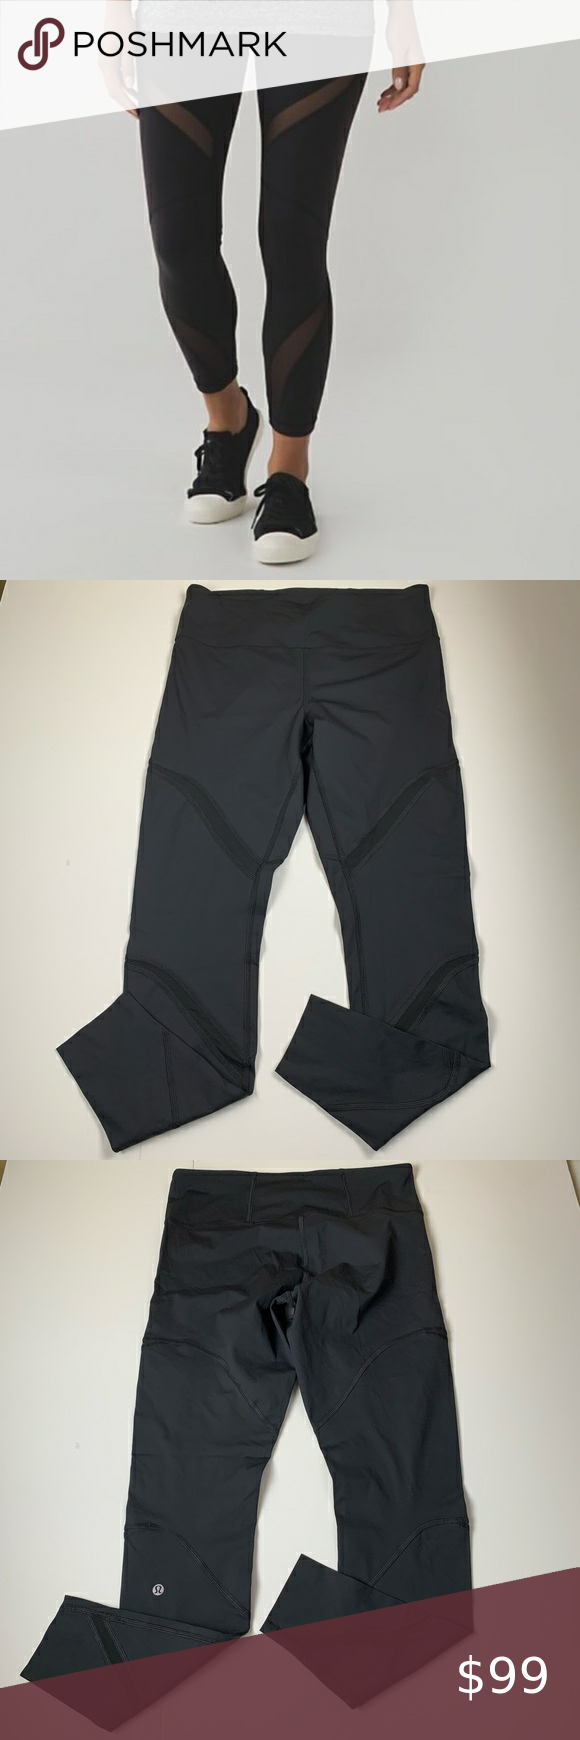 "NWOT Lululemon Black Mesh Panel 28"" Tight NWOT Lululemon Black Mesh Panel Tight. Size 12. Never worn. New without price tags. Approximate Flat Measurements Waist 15.5"", Rise 10"", Inseam 28"". 3 front mesh panels. Back waistband pocket. Color: Black 0023 lululemon athletica Pants Leggings"